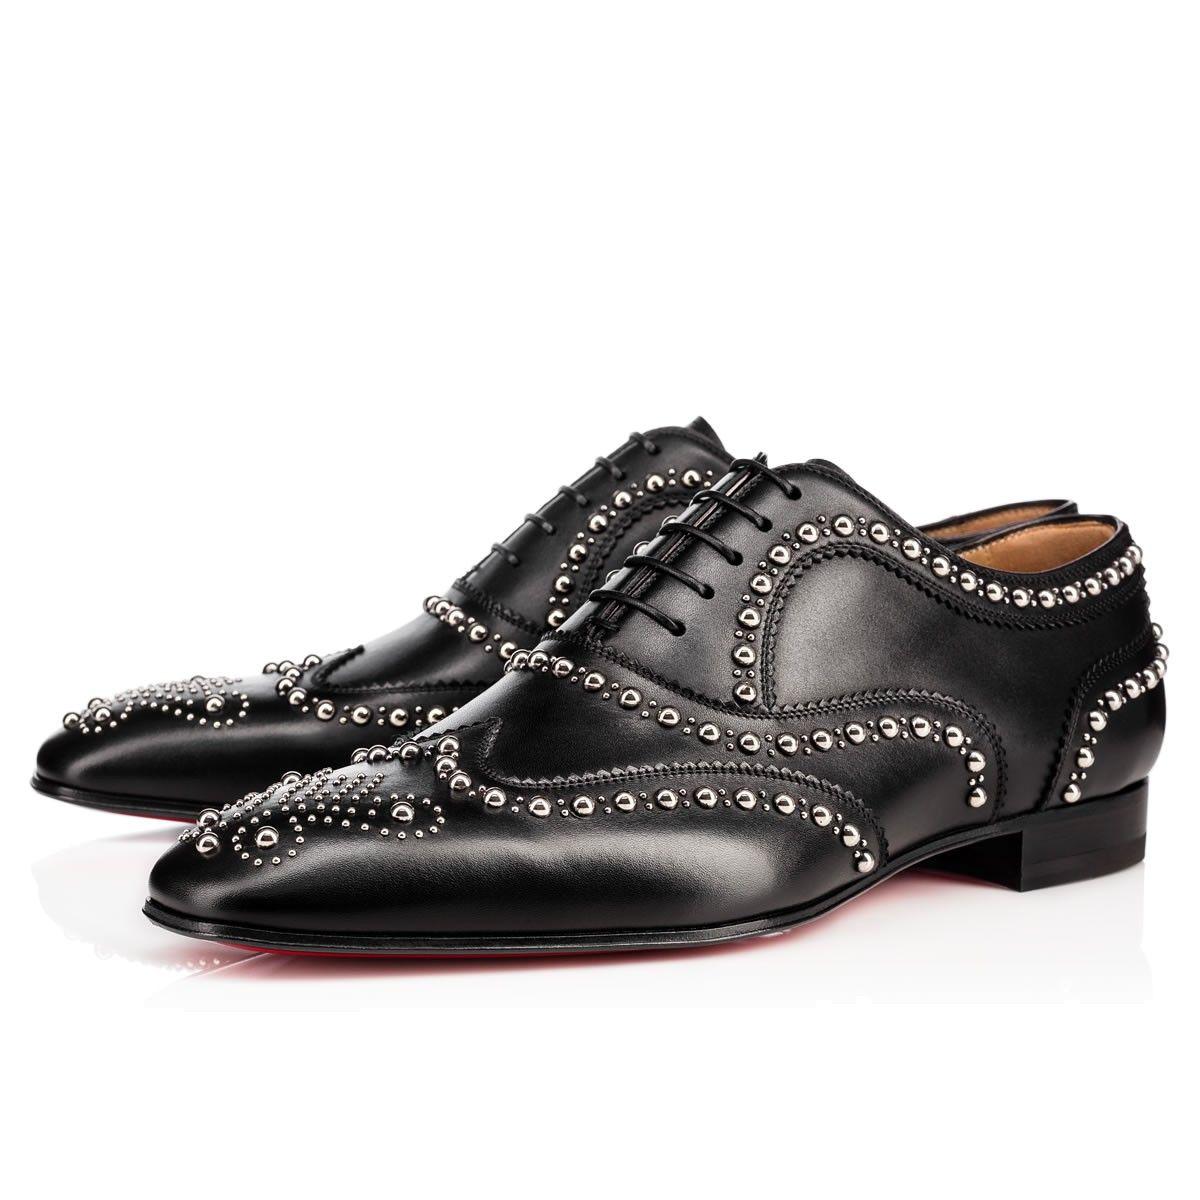 christian louboutin charlie clou vintage calf black silver calfskin rh pinterest com